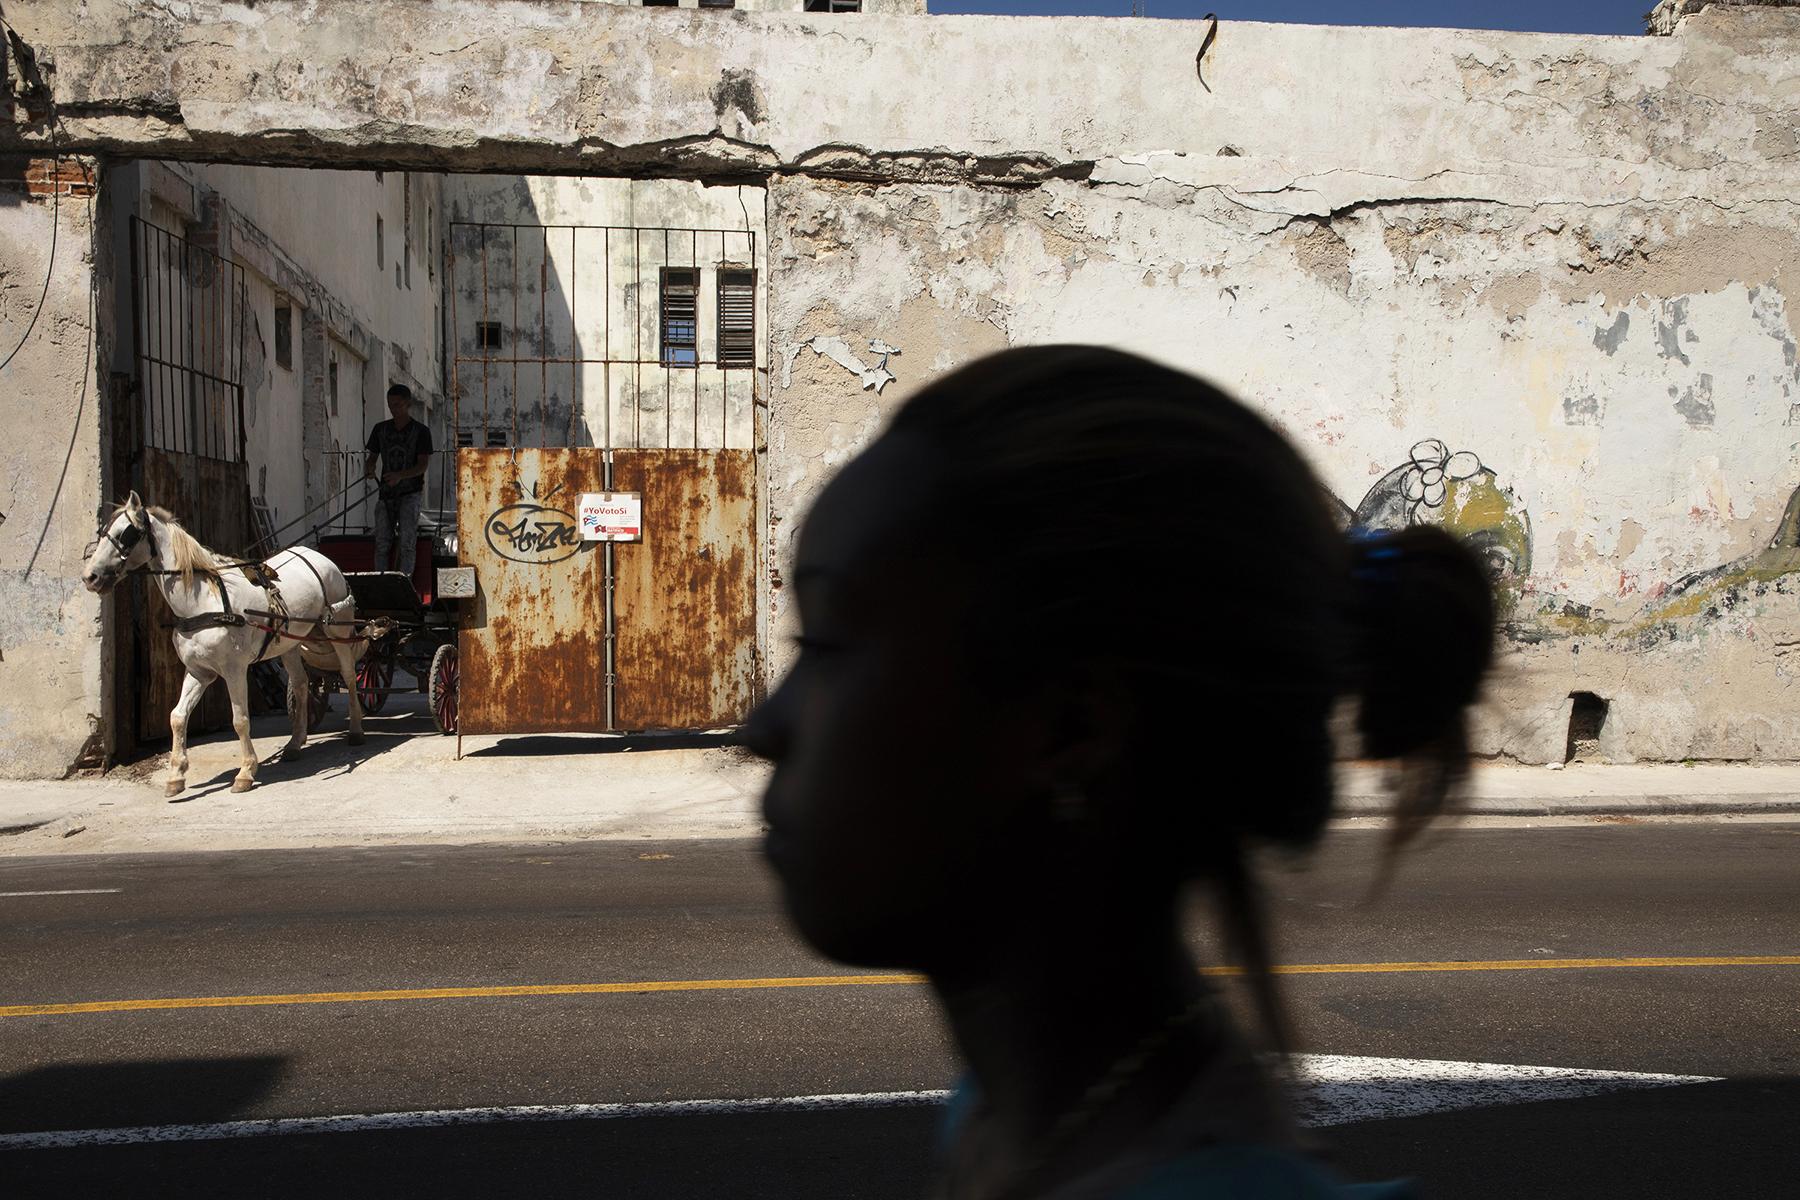 c-Sarah_Hoskins_-cuba_-street--havana